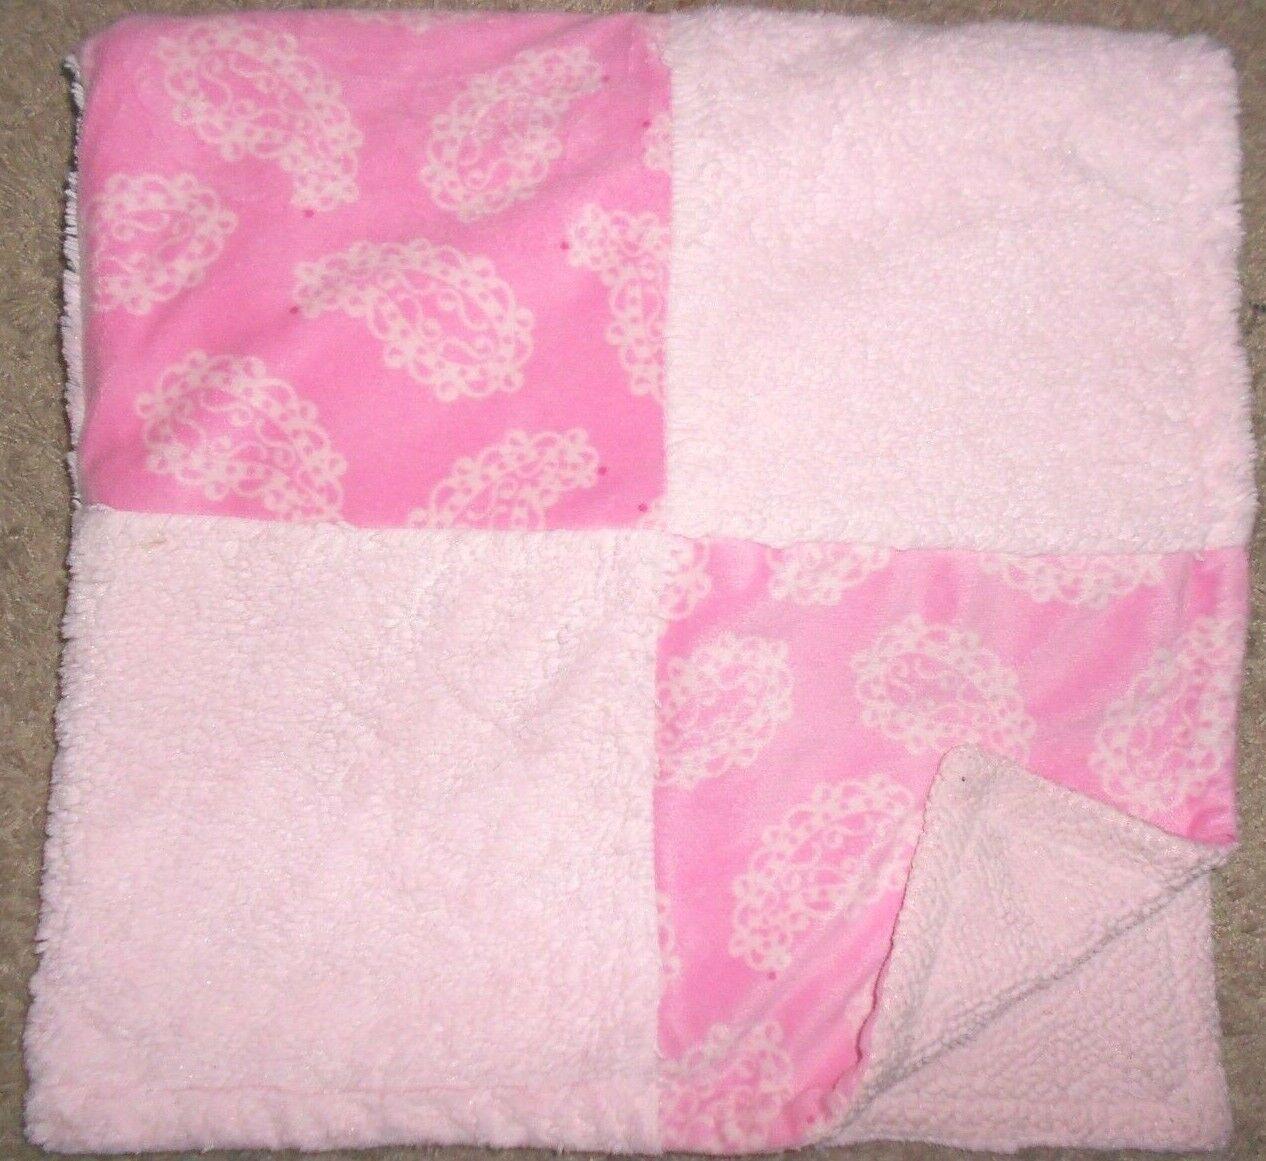 6894181f2 Koala Baby Pink Blanket Paisley Square and 50 similar items. 57